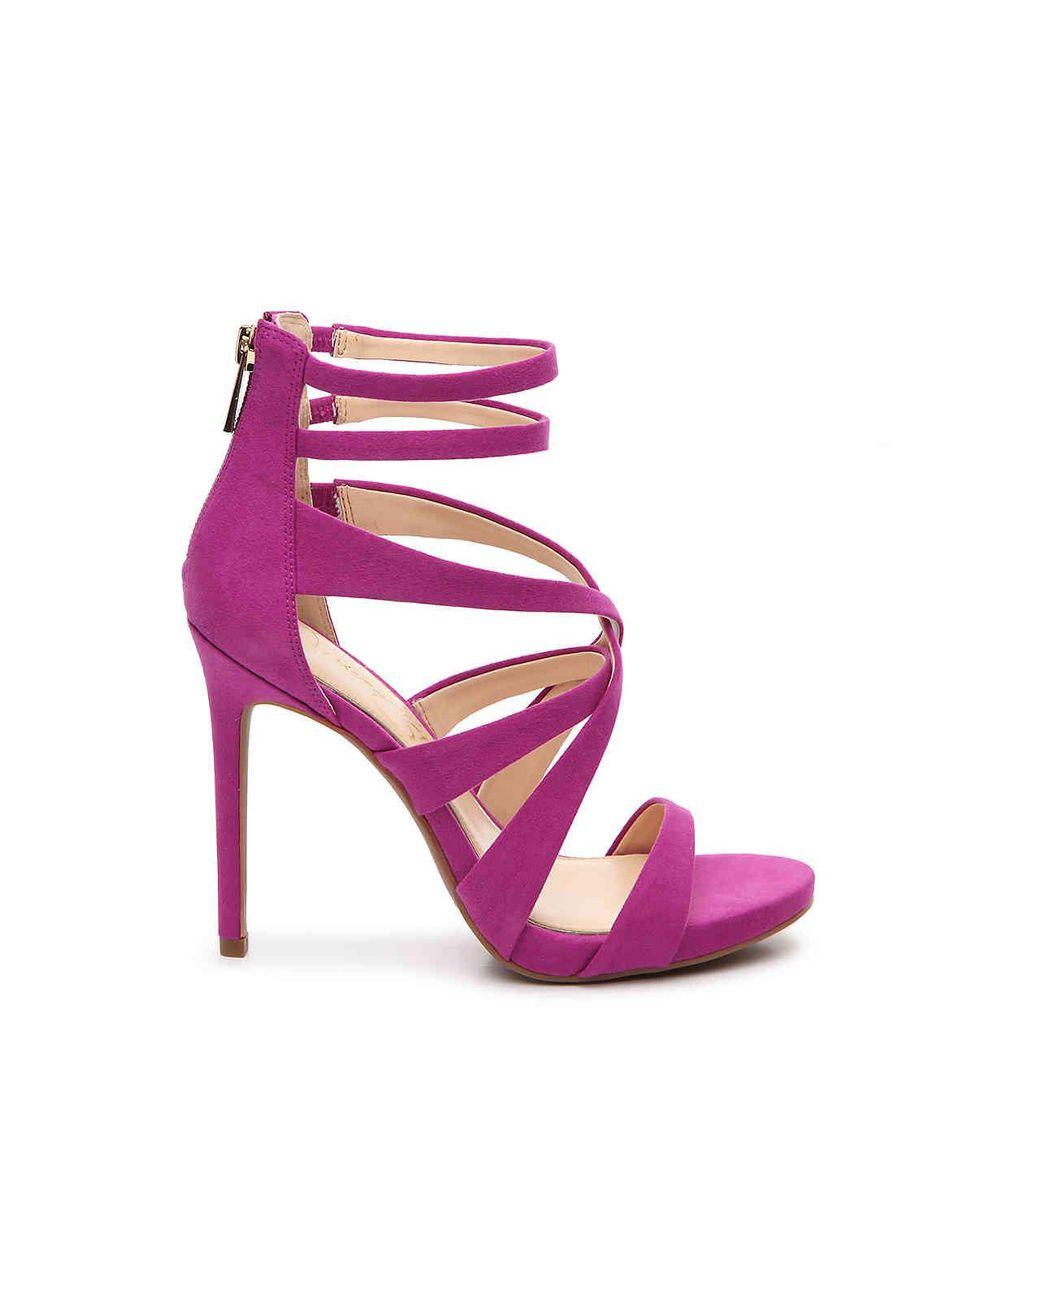 d0c91ecf5b4d Lyst - Jessica Simpson Rayomi Platform Sandal in Pink